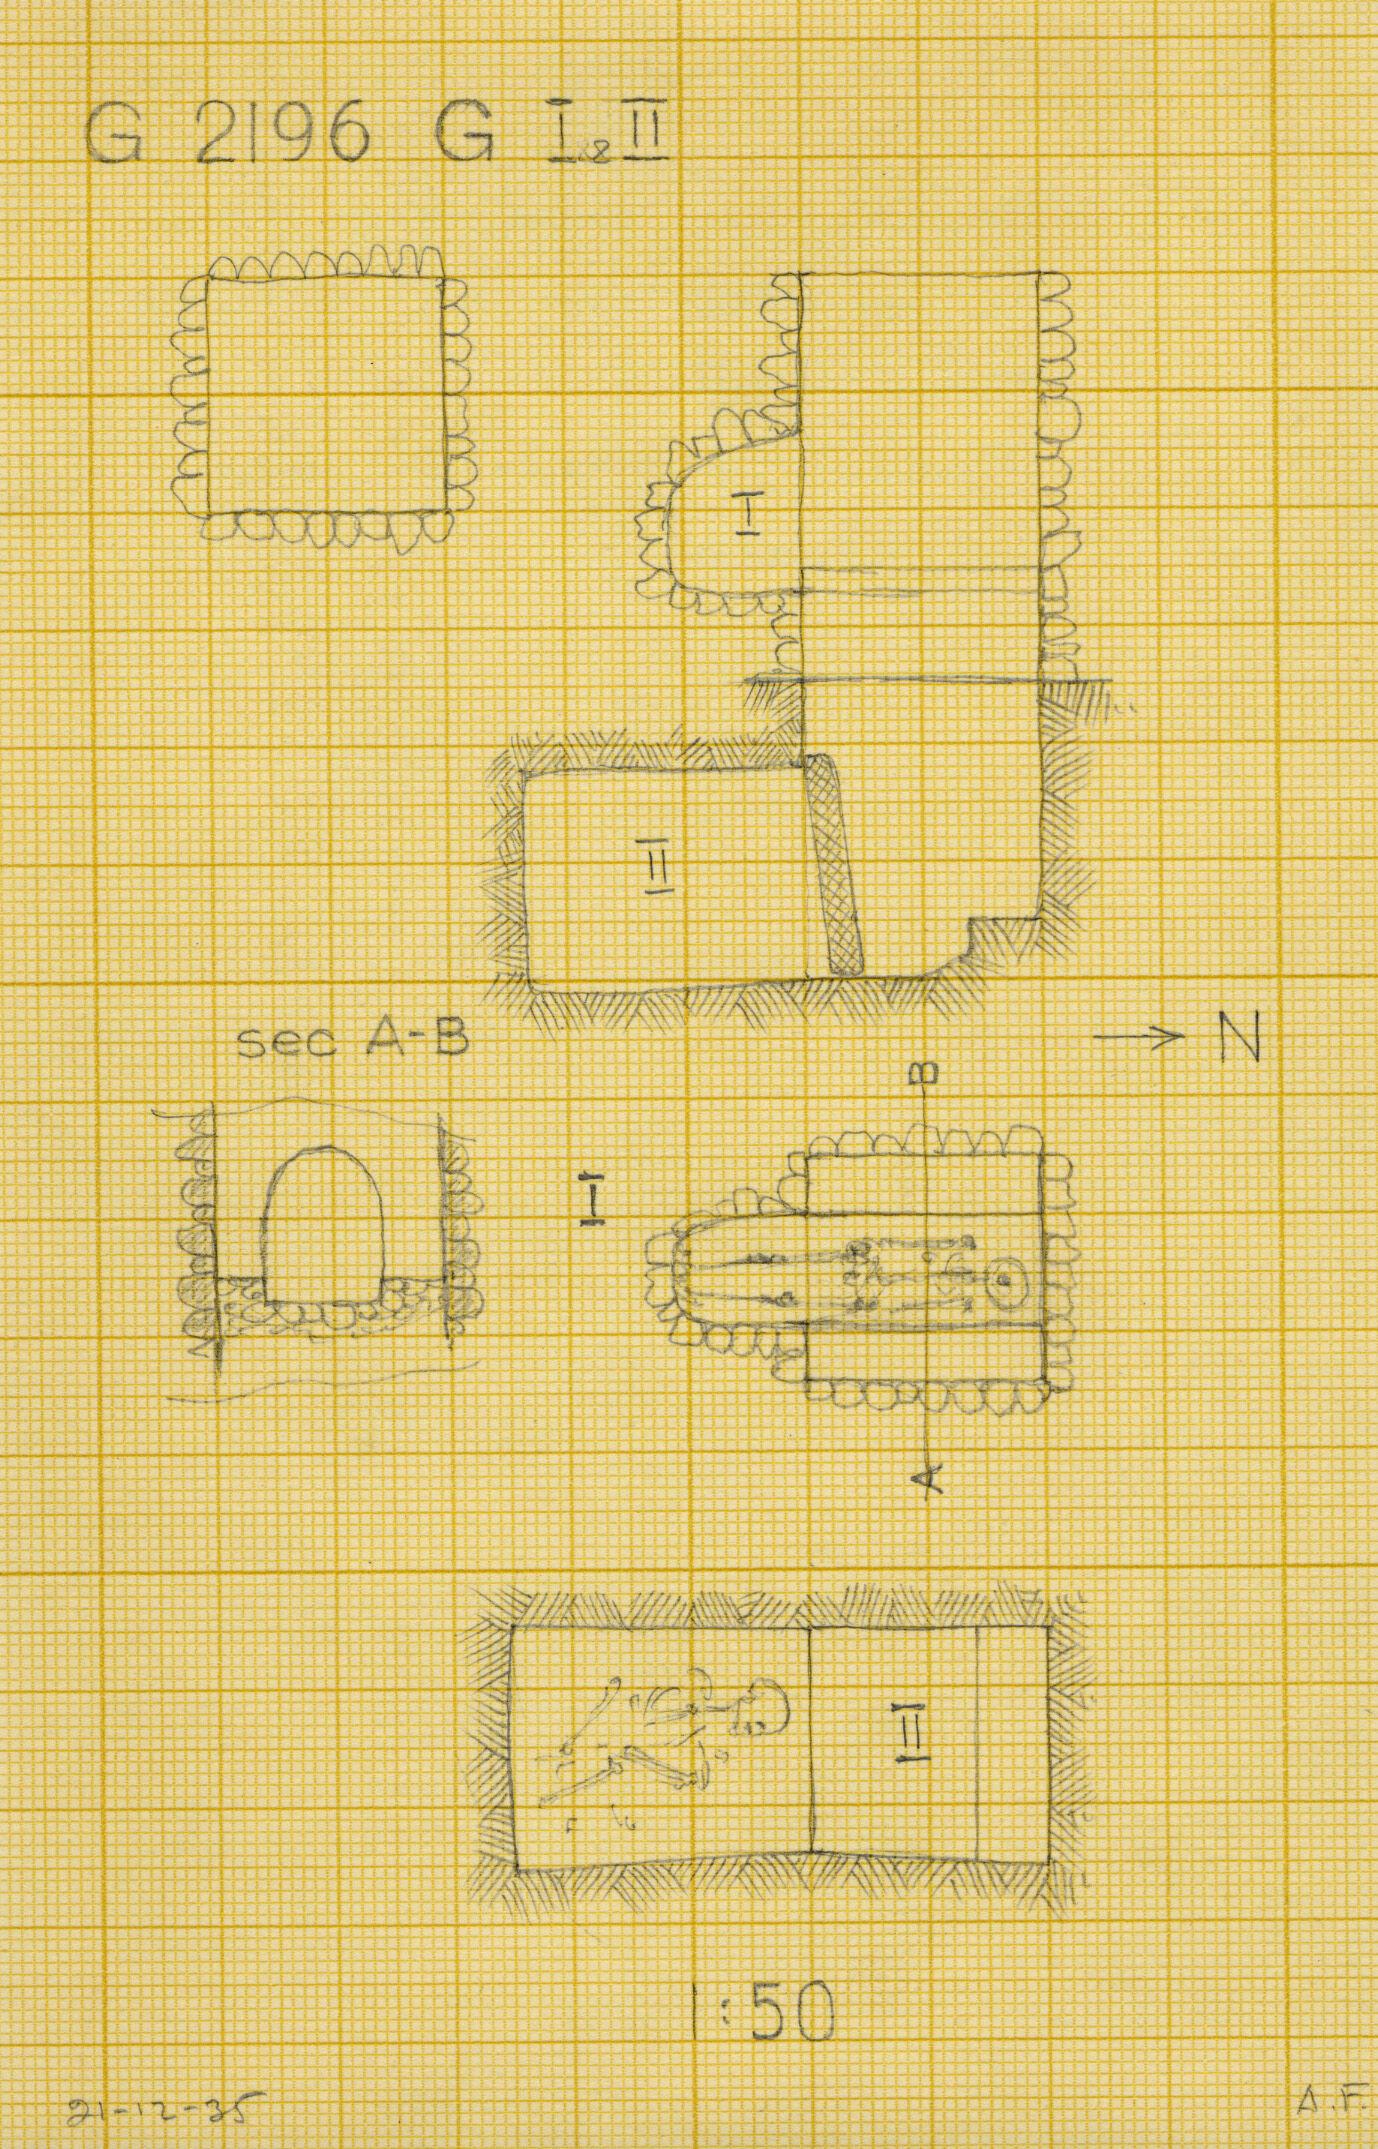 Maps and plans: G 2196, Shaft G (I & II)